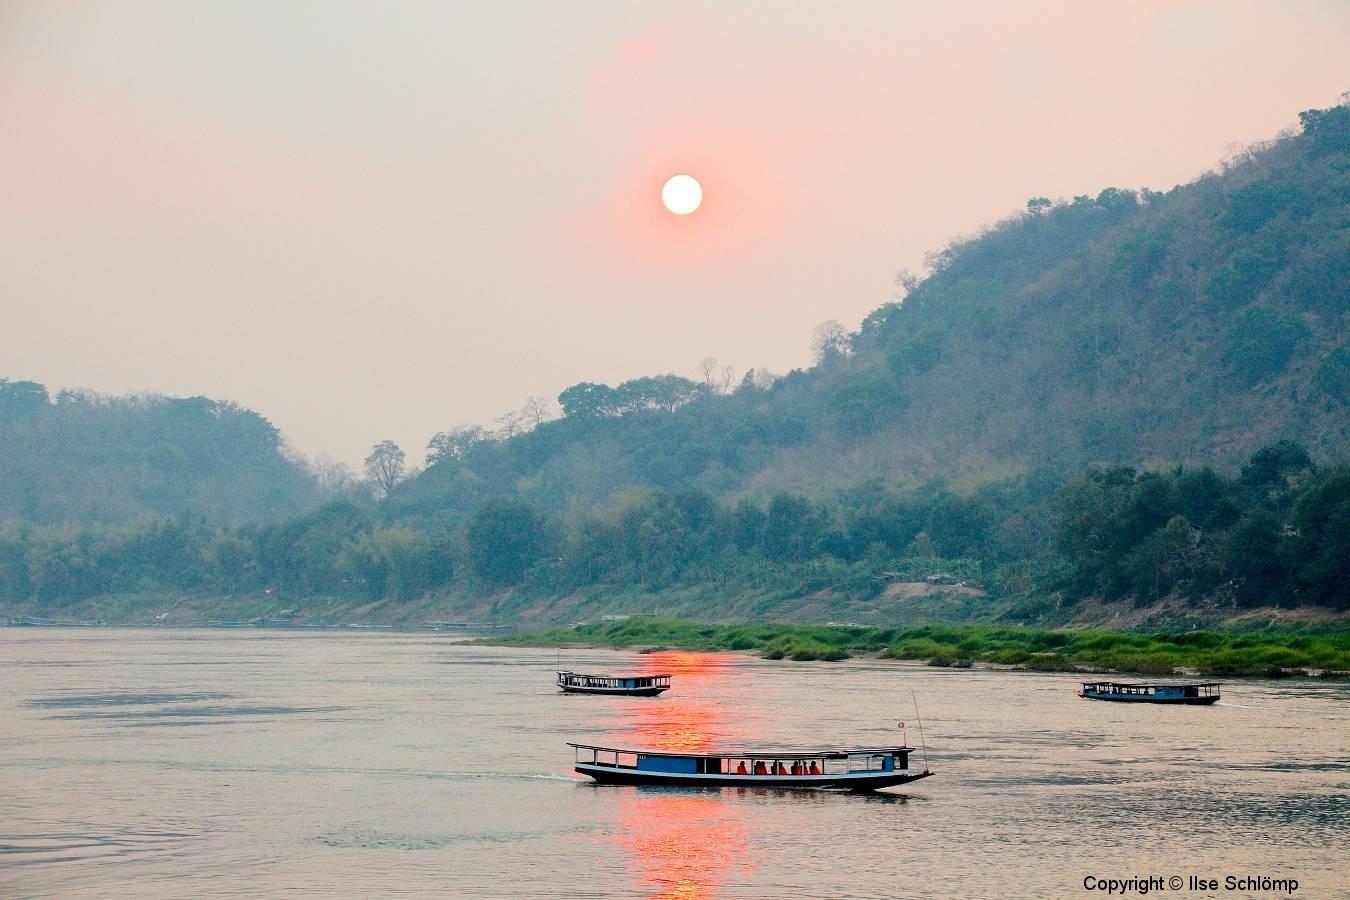 Laos, Luang Prabang, Sonnenuntergang am Mekong